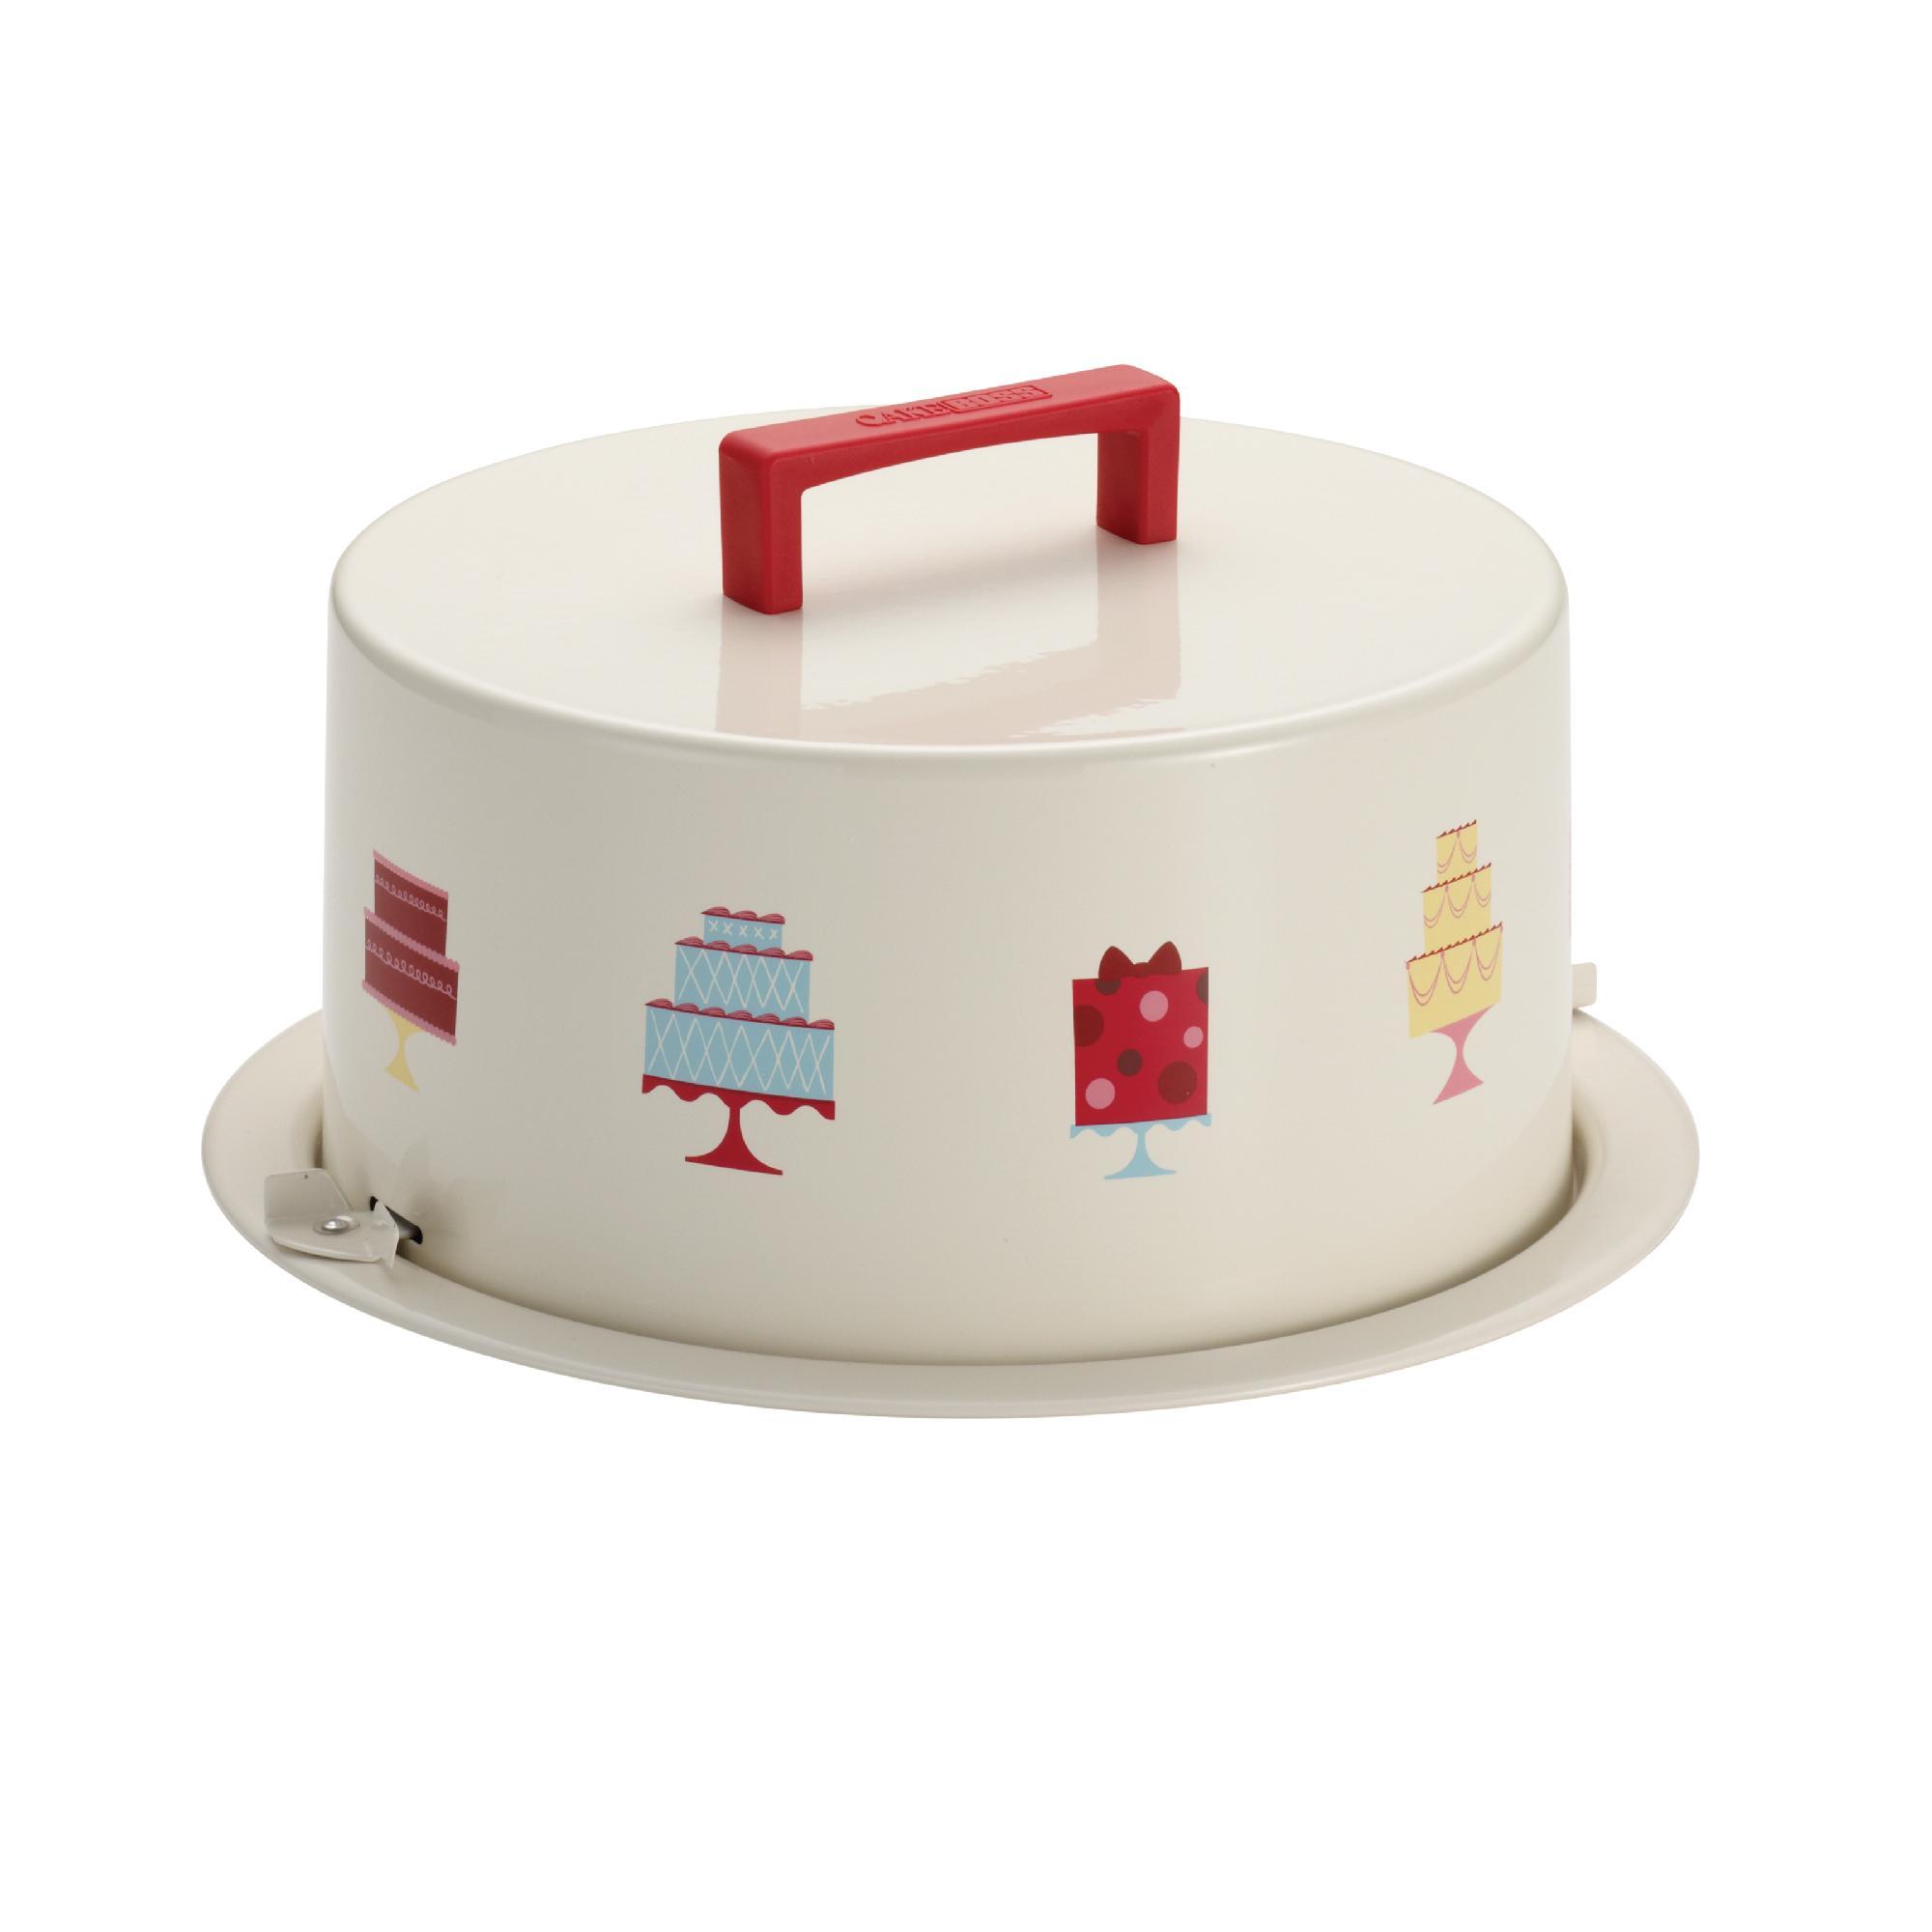 Cake Boss Serveware Metal Cake Carrier,